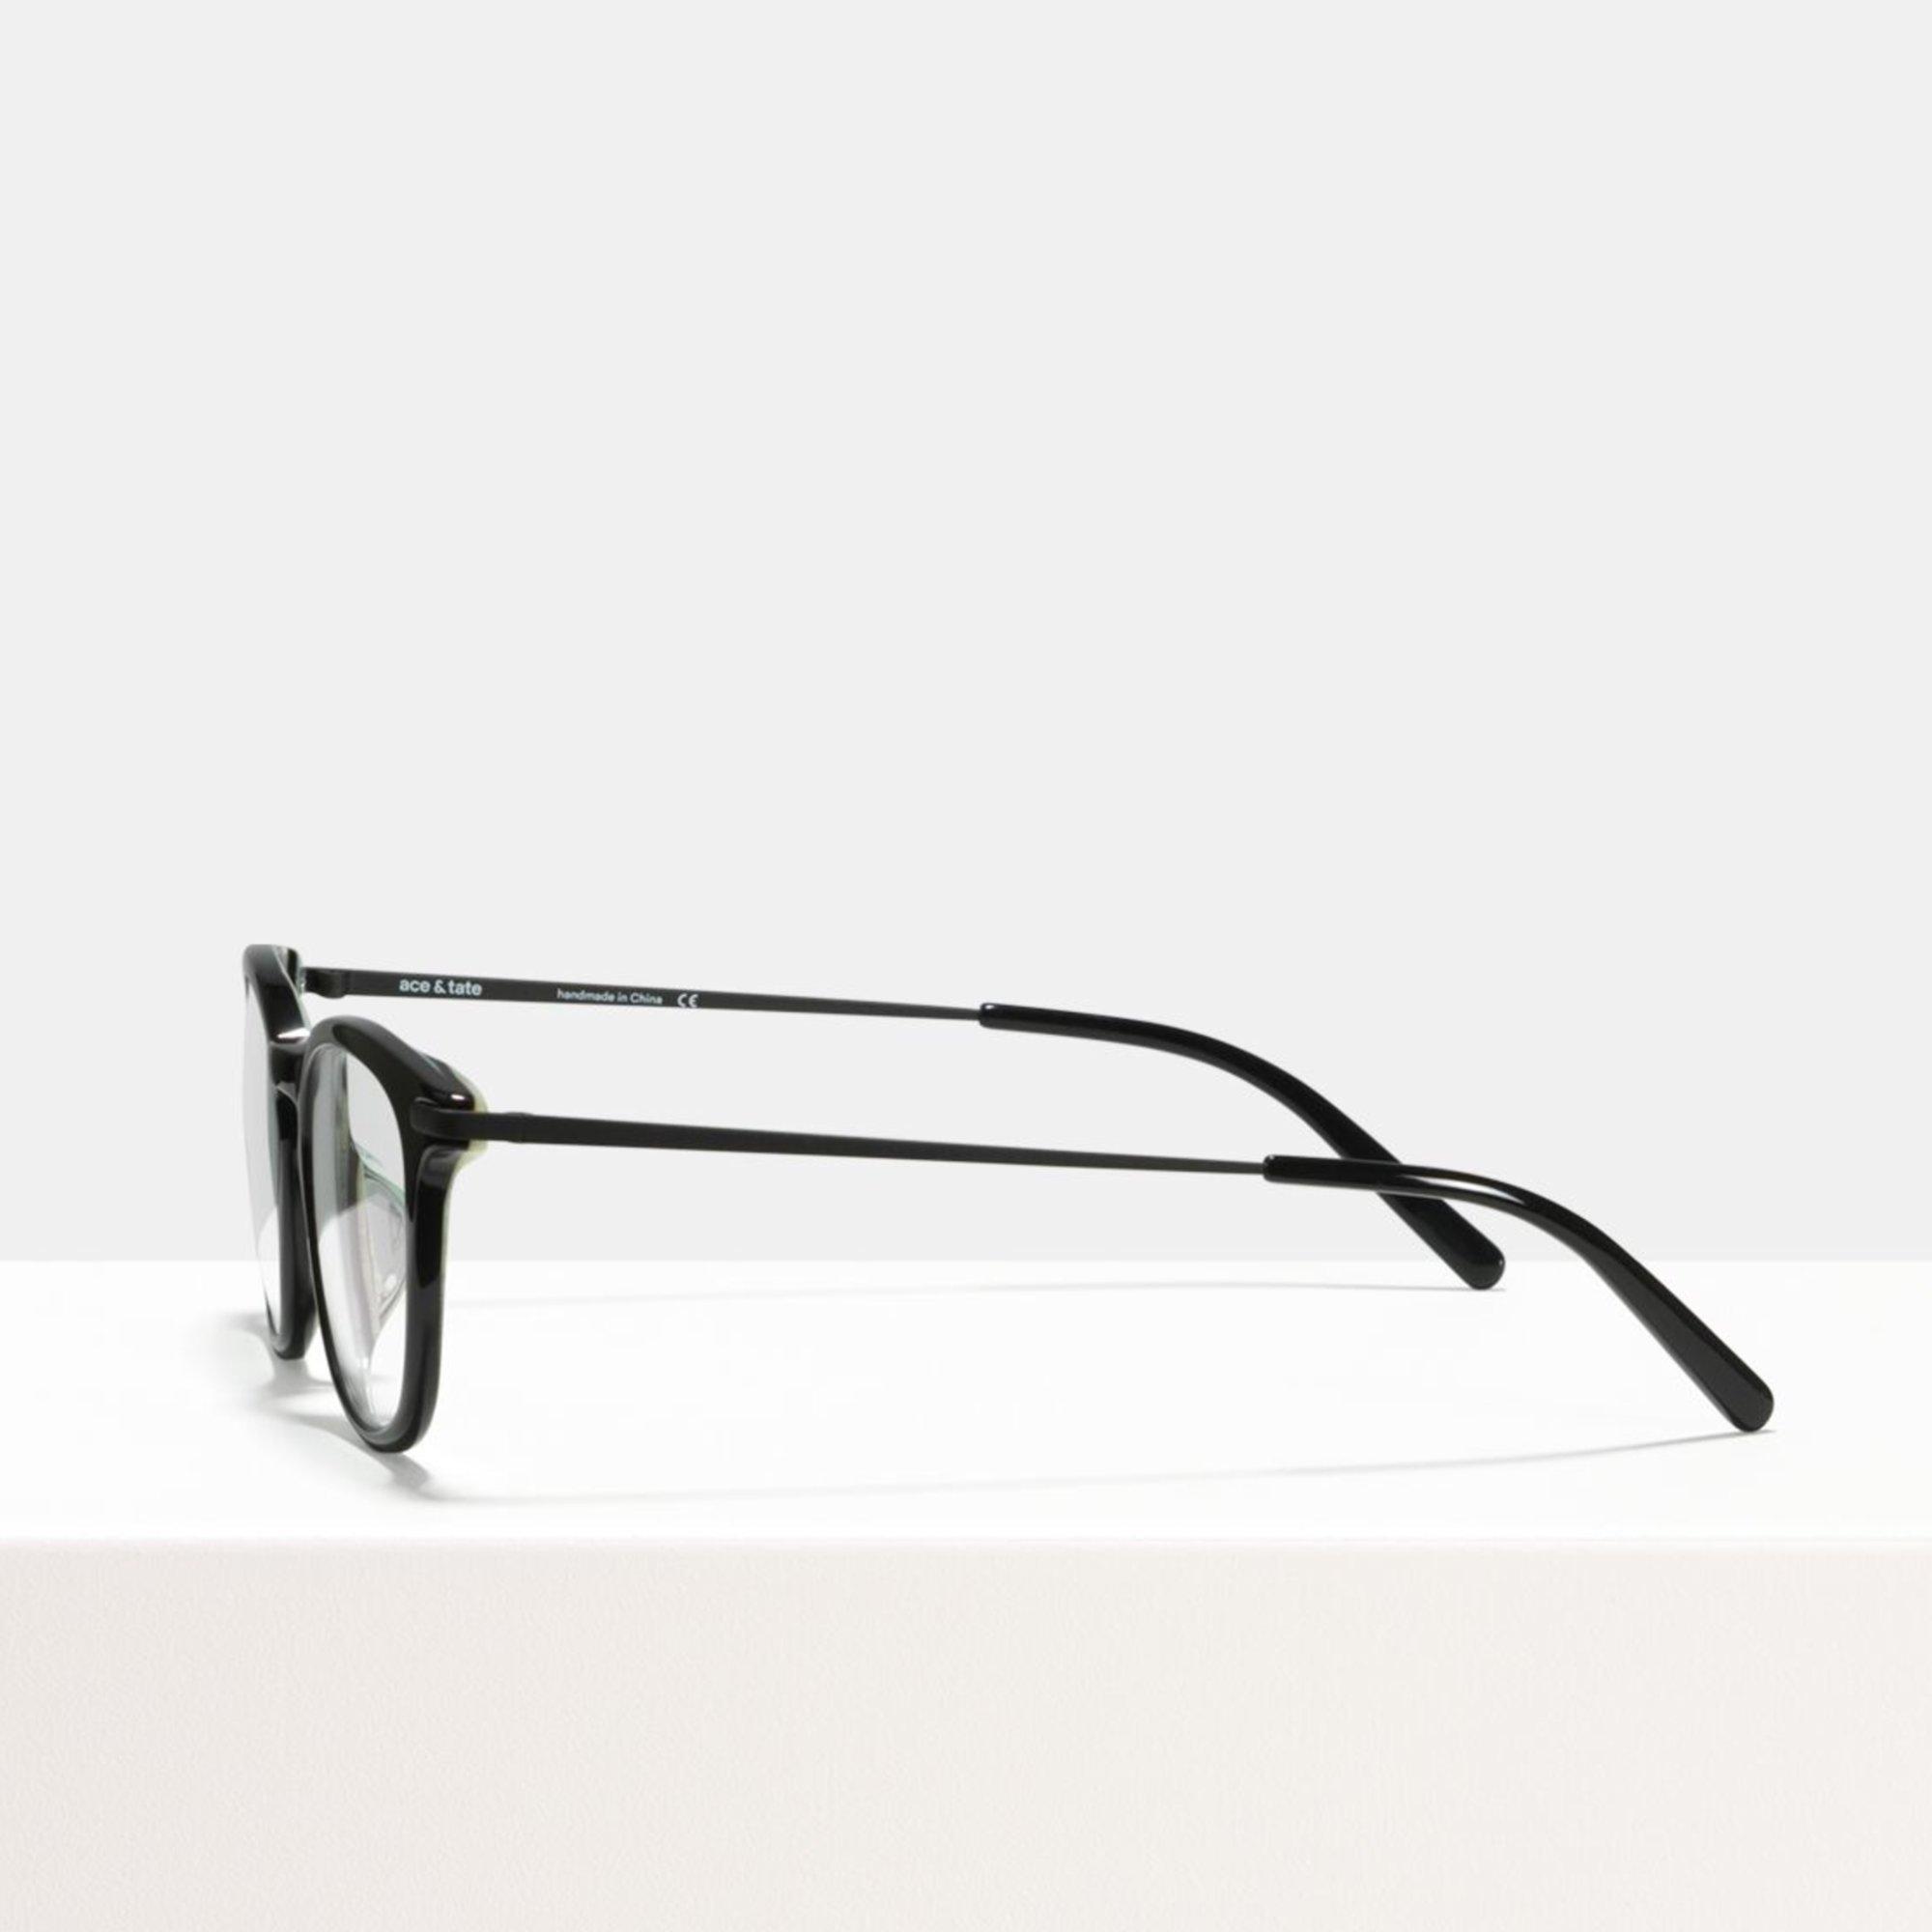 Ace & Tate Glasses   square acetate in Black